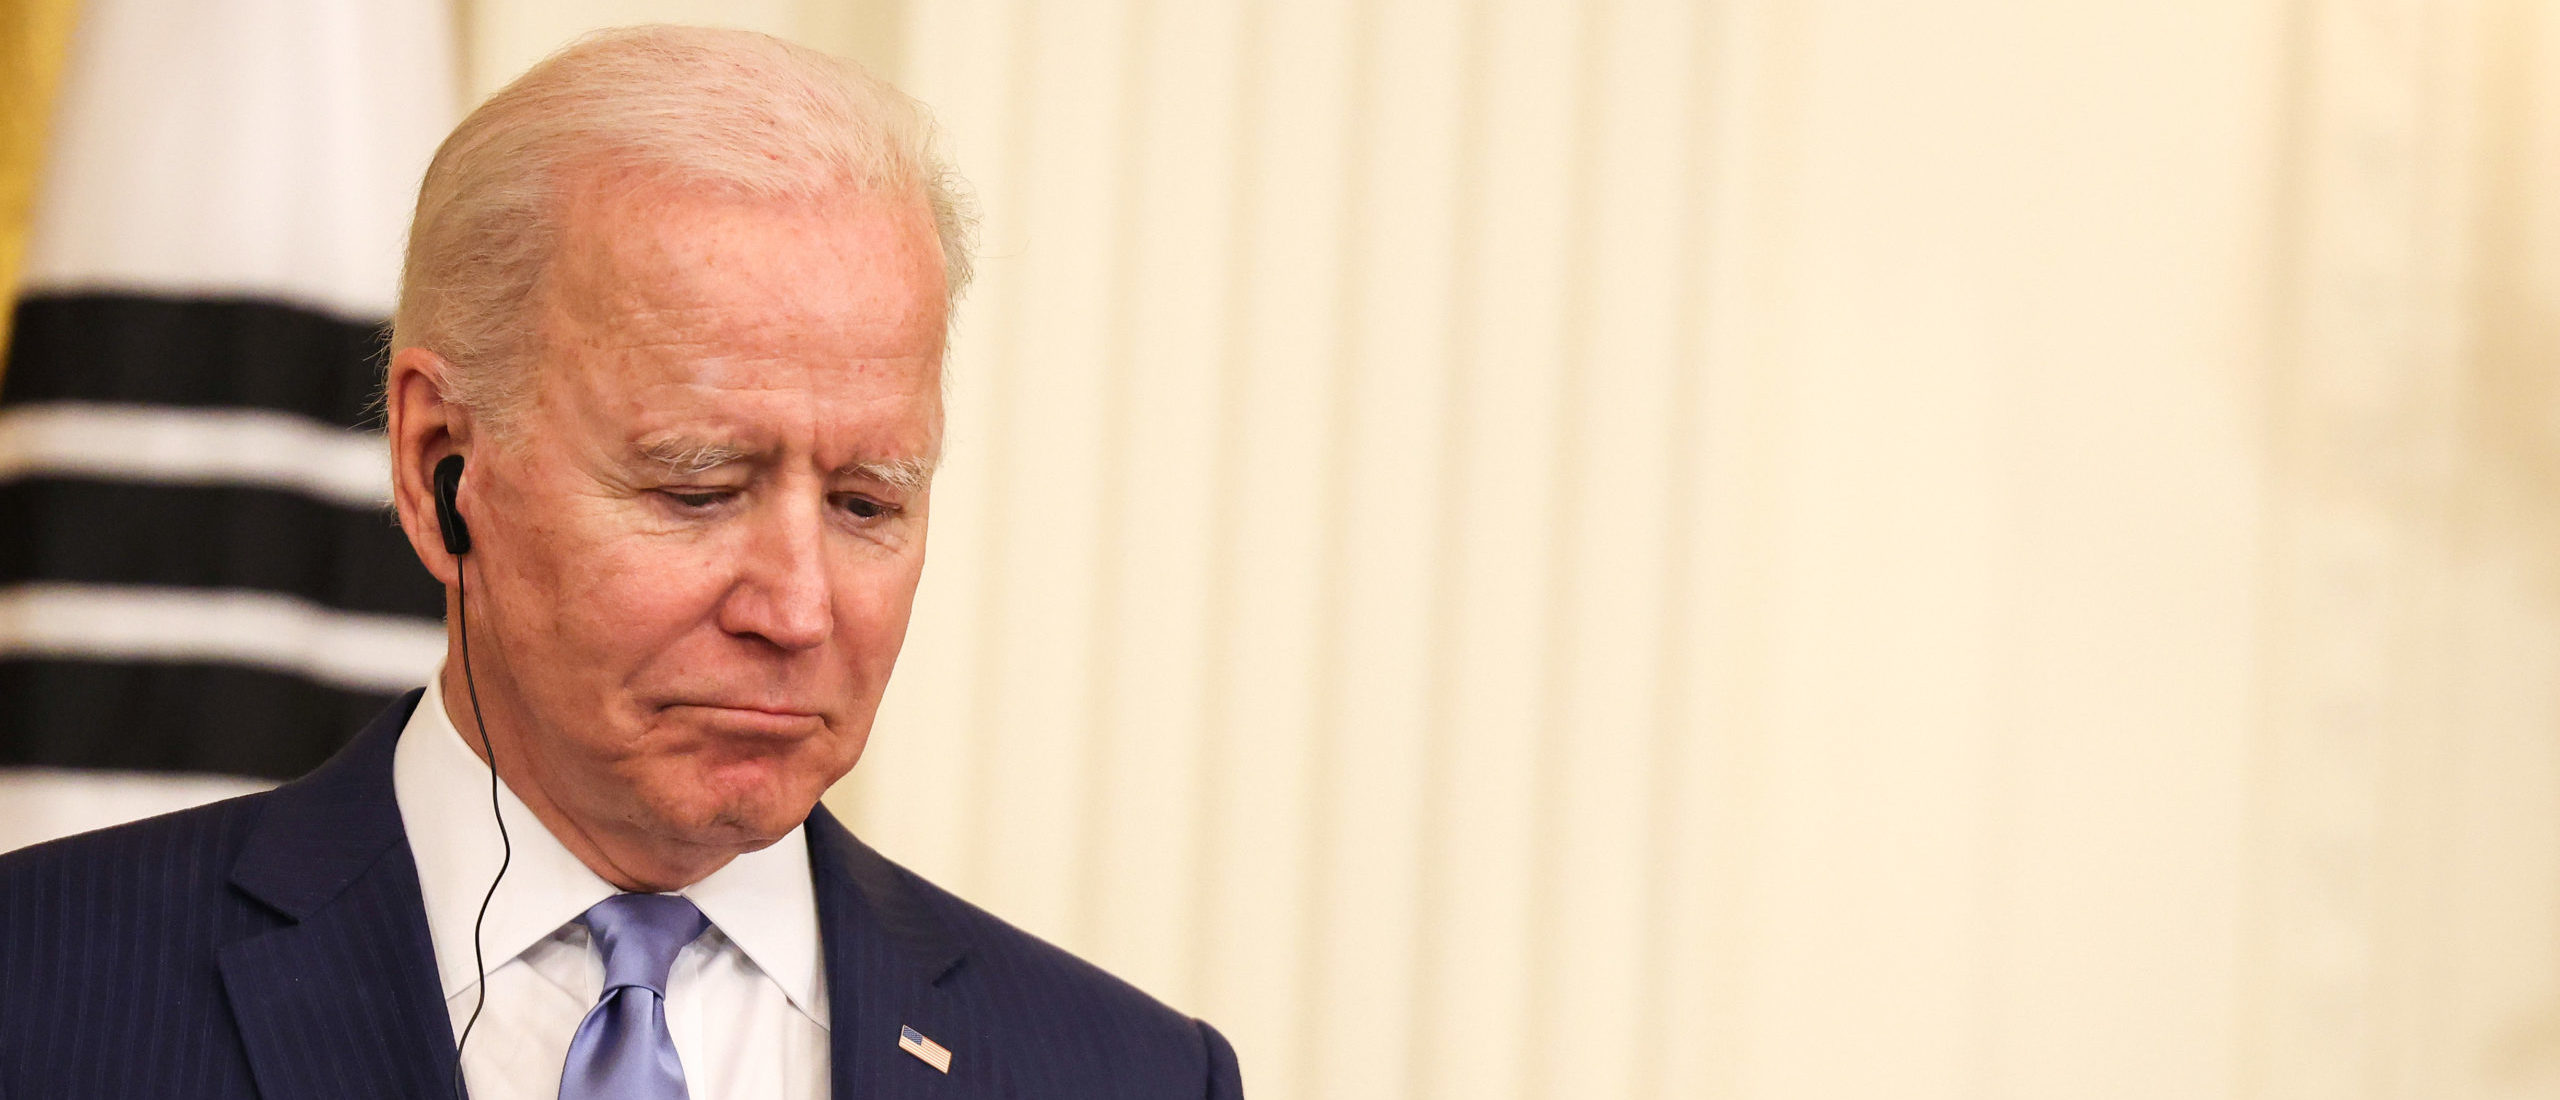 <p>Infrastructure Talks Hit Snag After GOP Response To Biden's Counteroffer thumbnail